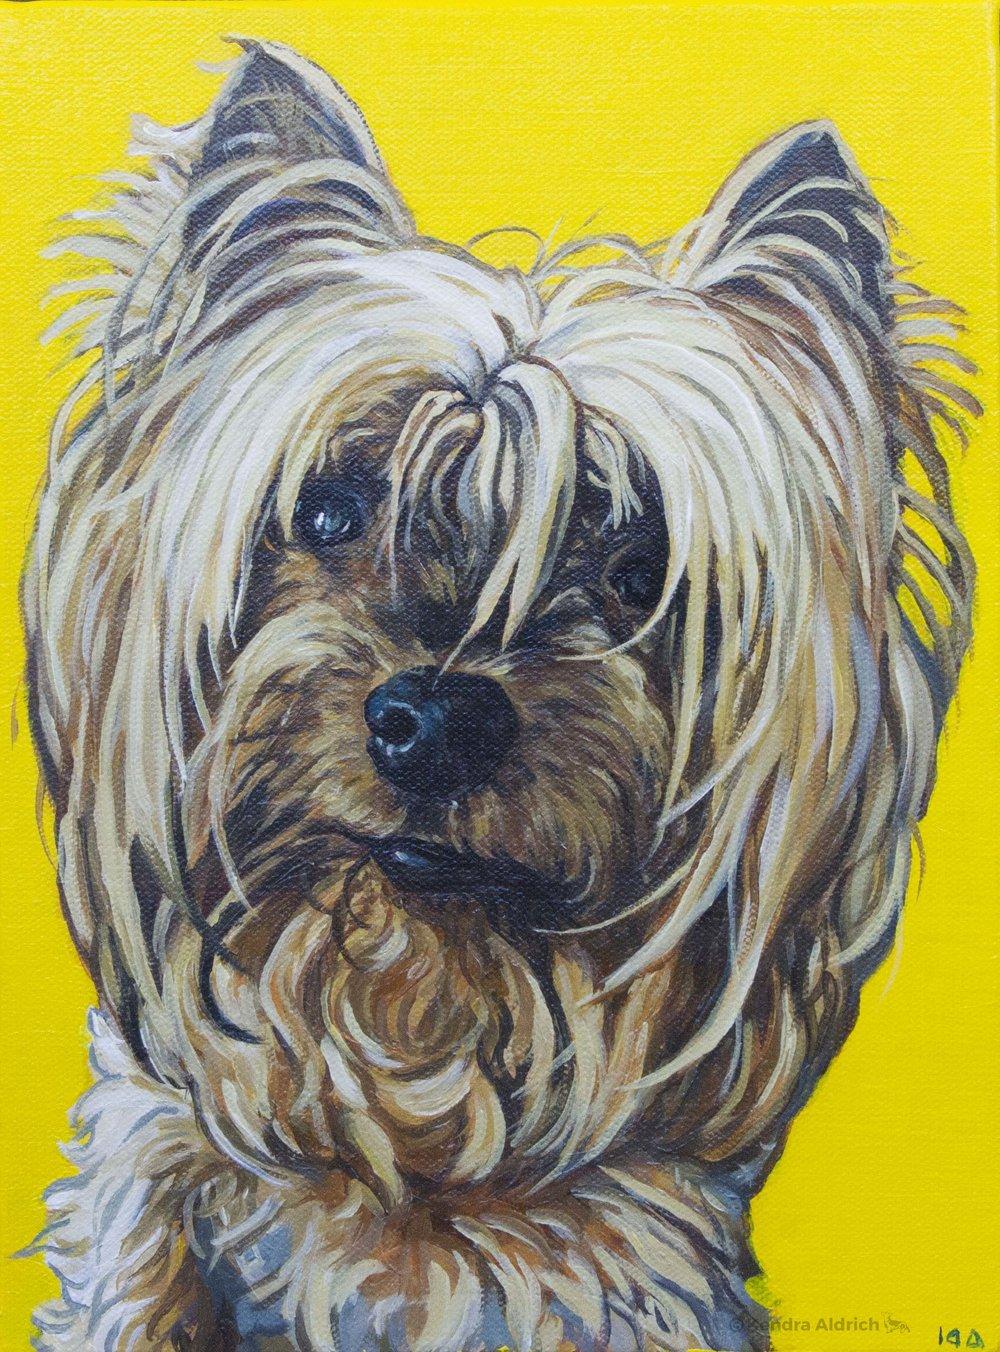 Miah, Acrylic on Canvas, 9x12